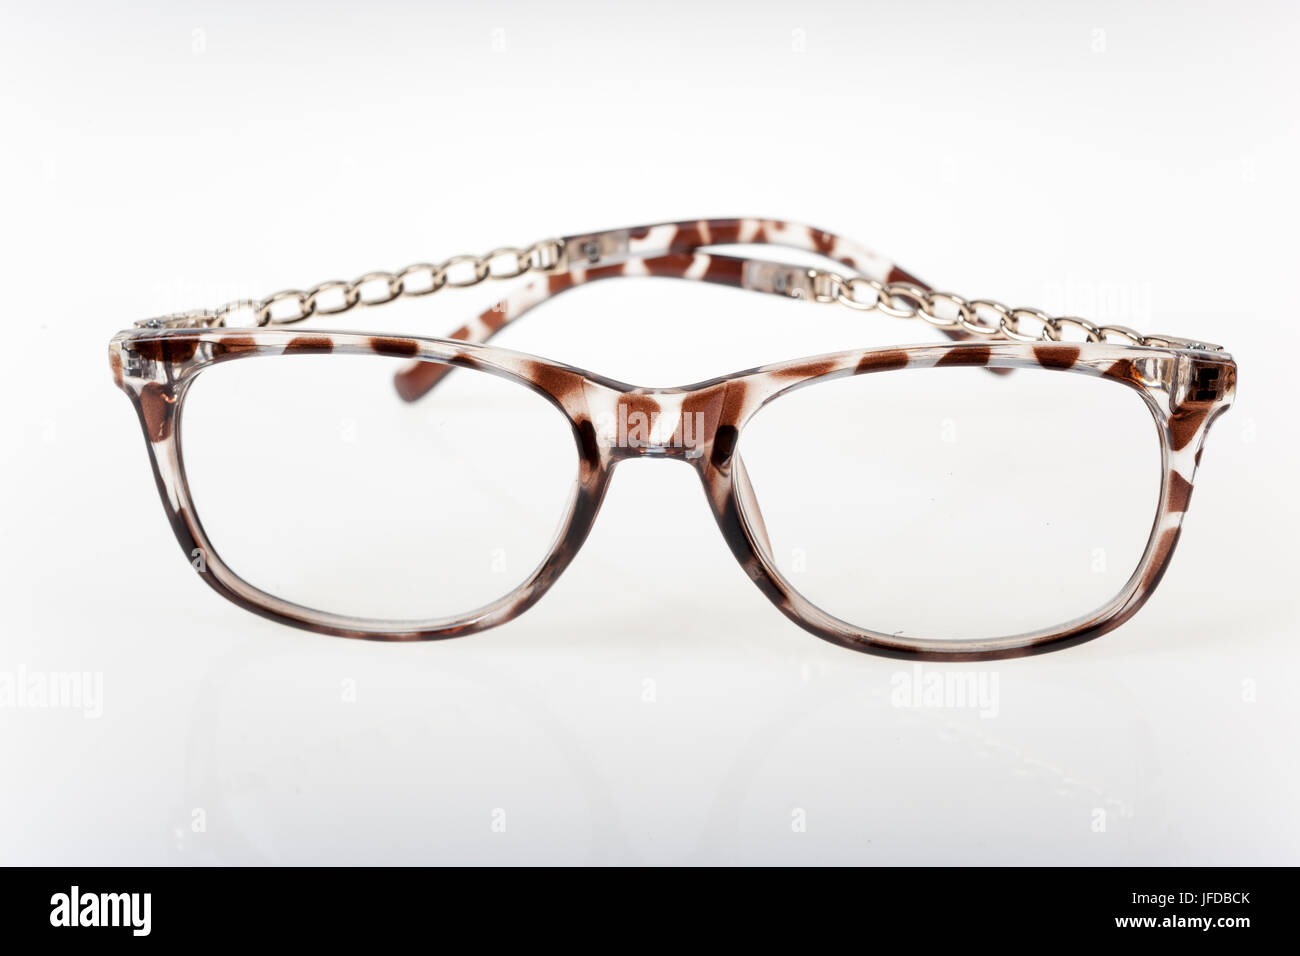 a8bea9a4f9e1c2 Vision Eyewear Stockfotos   Vision Eyewear Bilder - Alamy